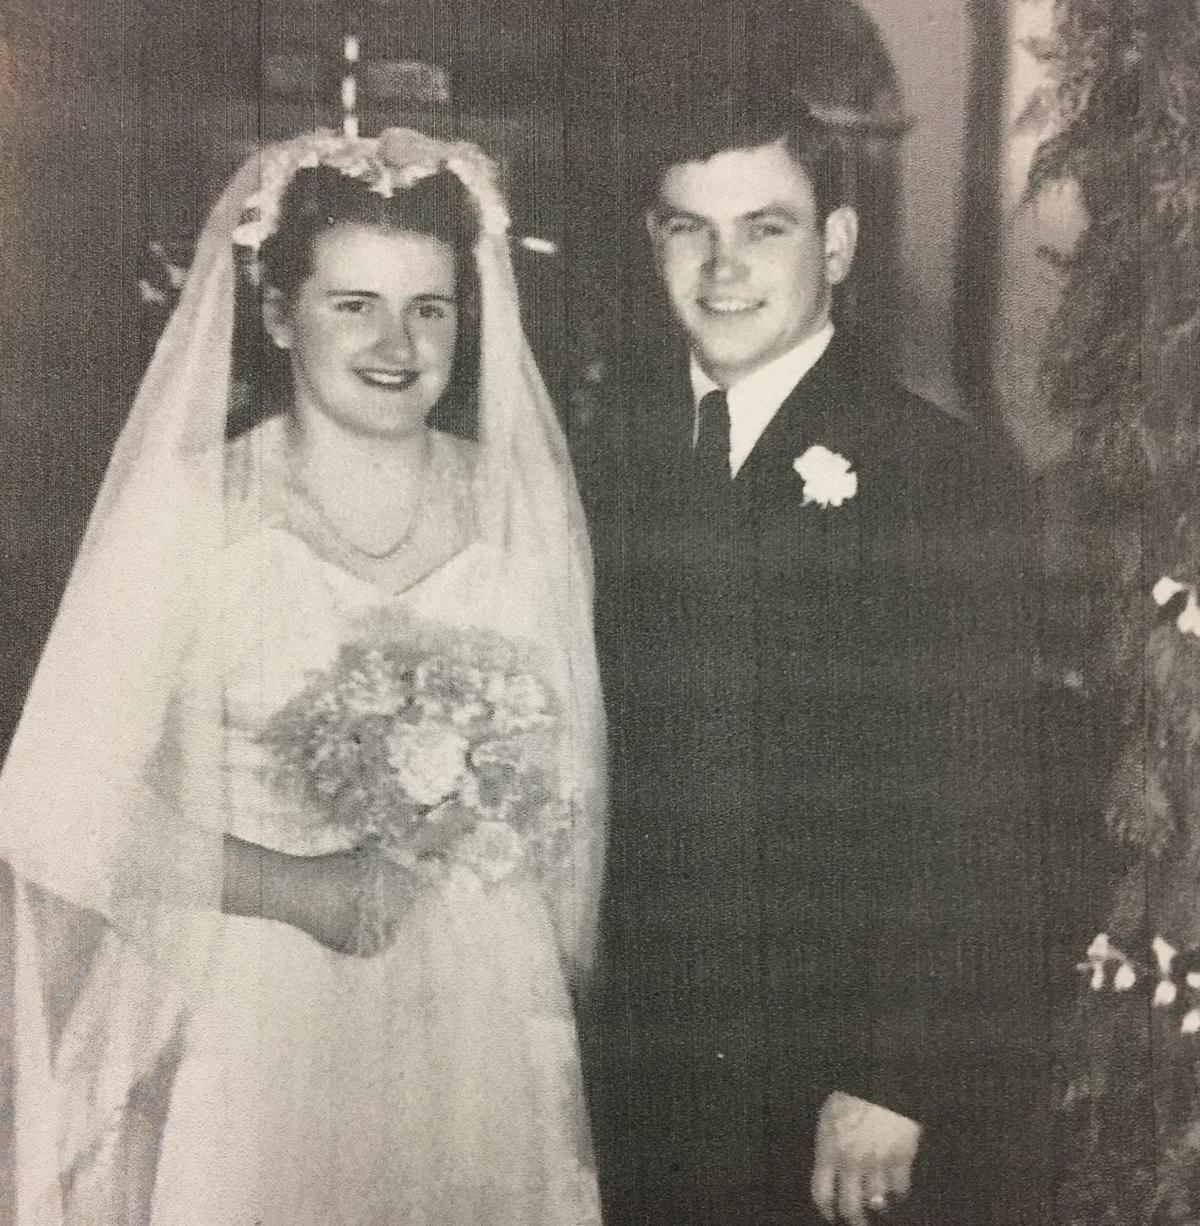 WW-II veteran Paul Betcher wedding photo from 1946